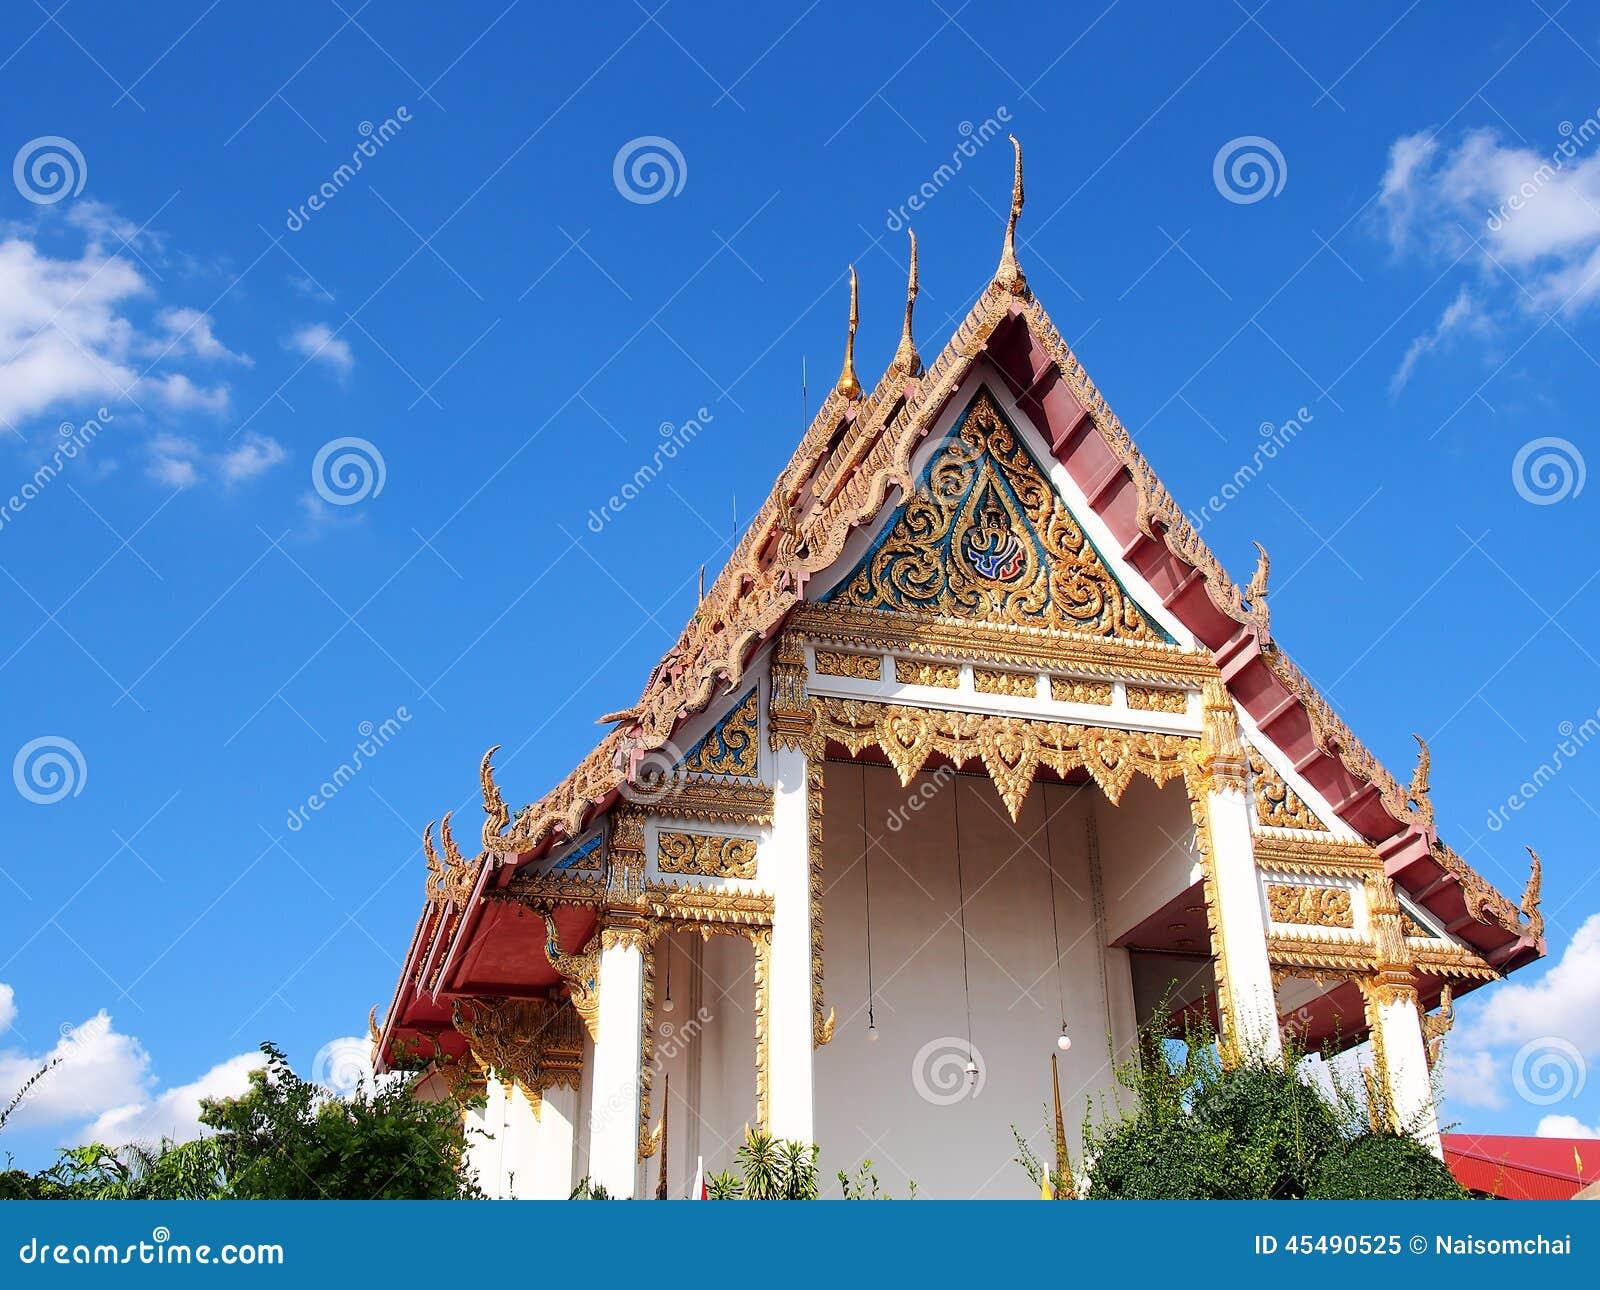 Wat racha phruk sa公羊泰国主要寺庙的鼓膜